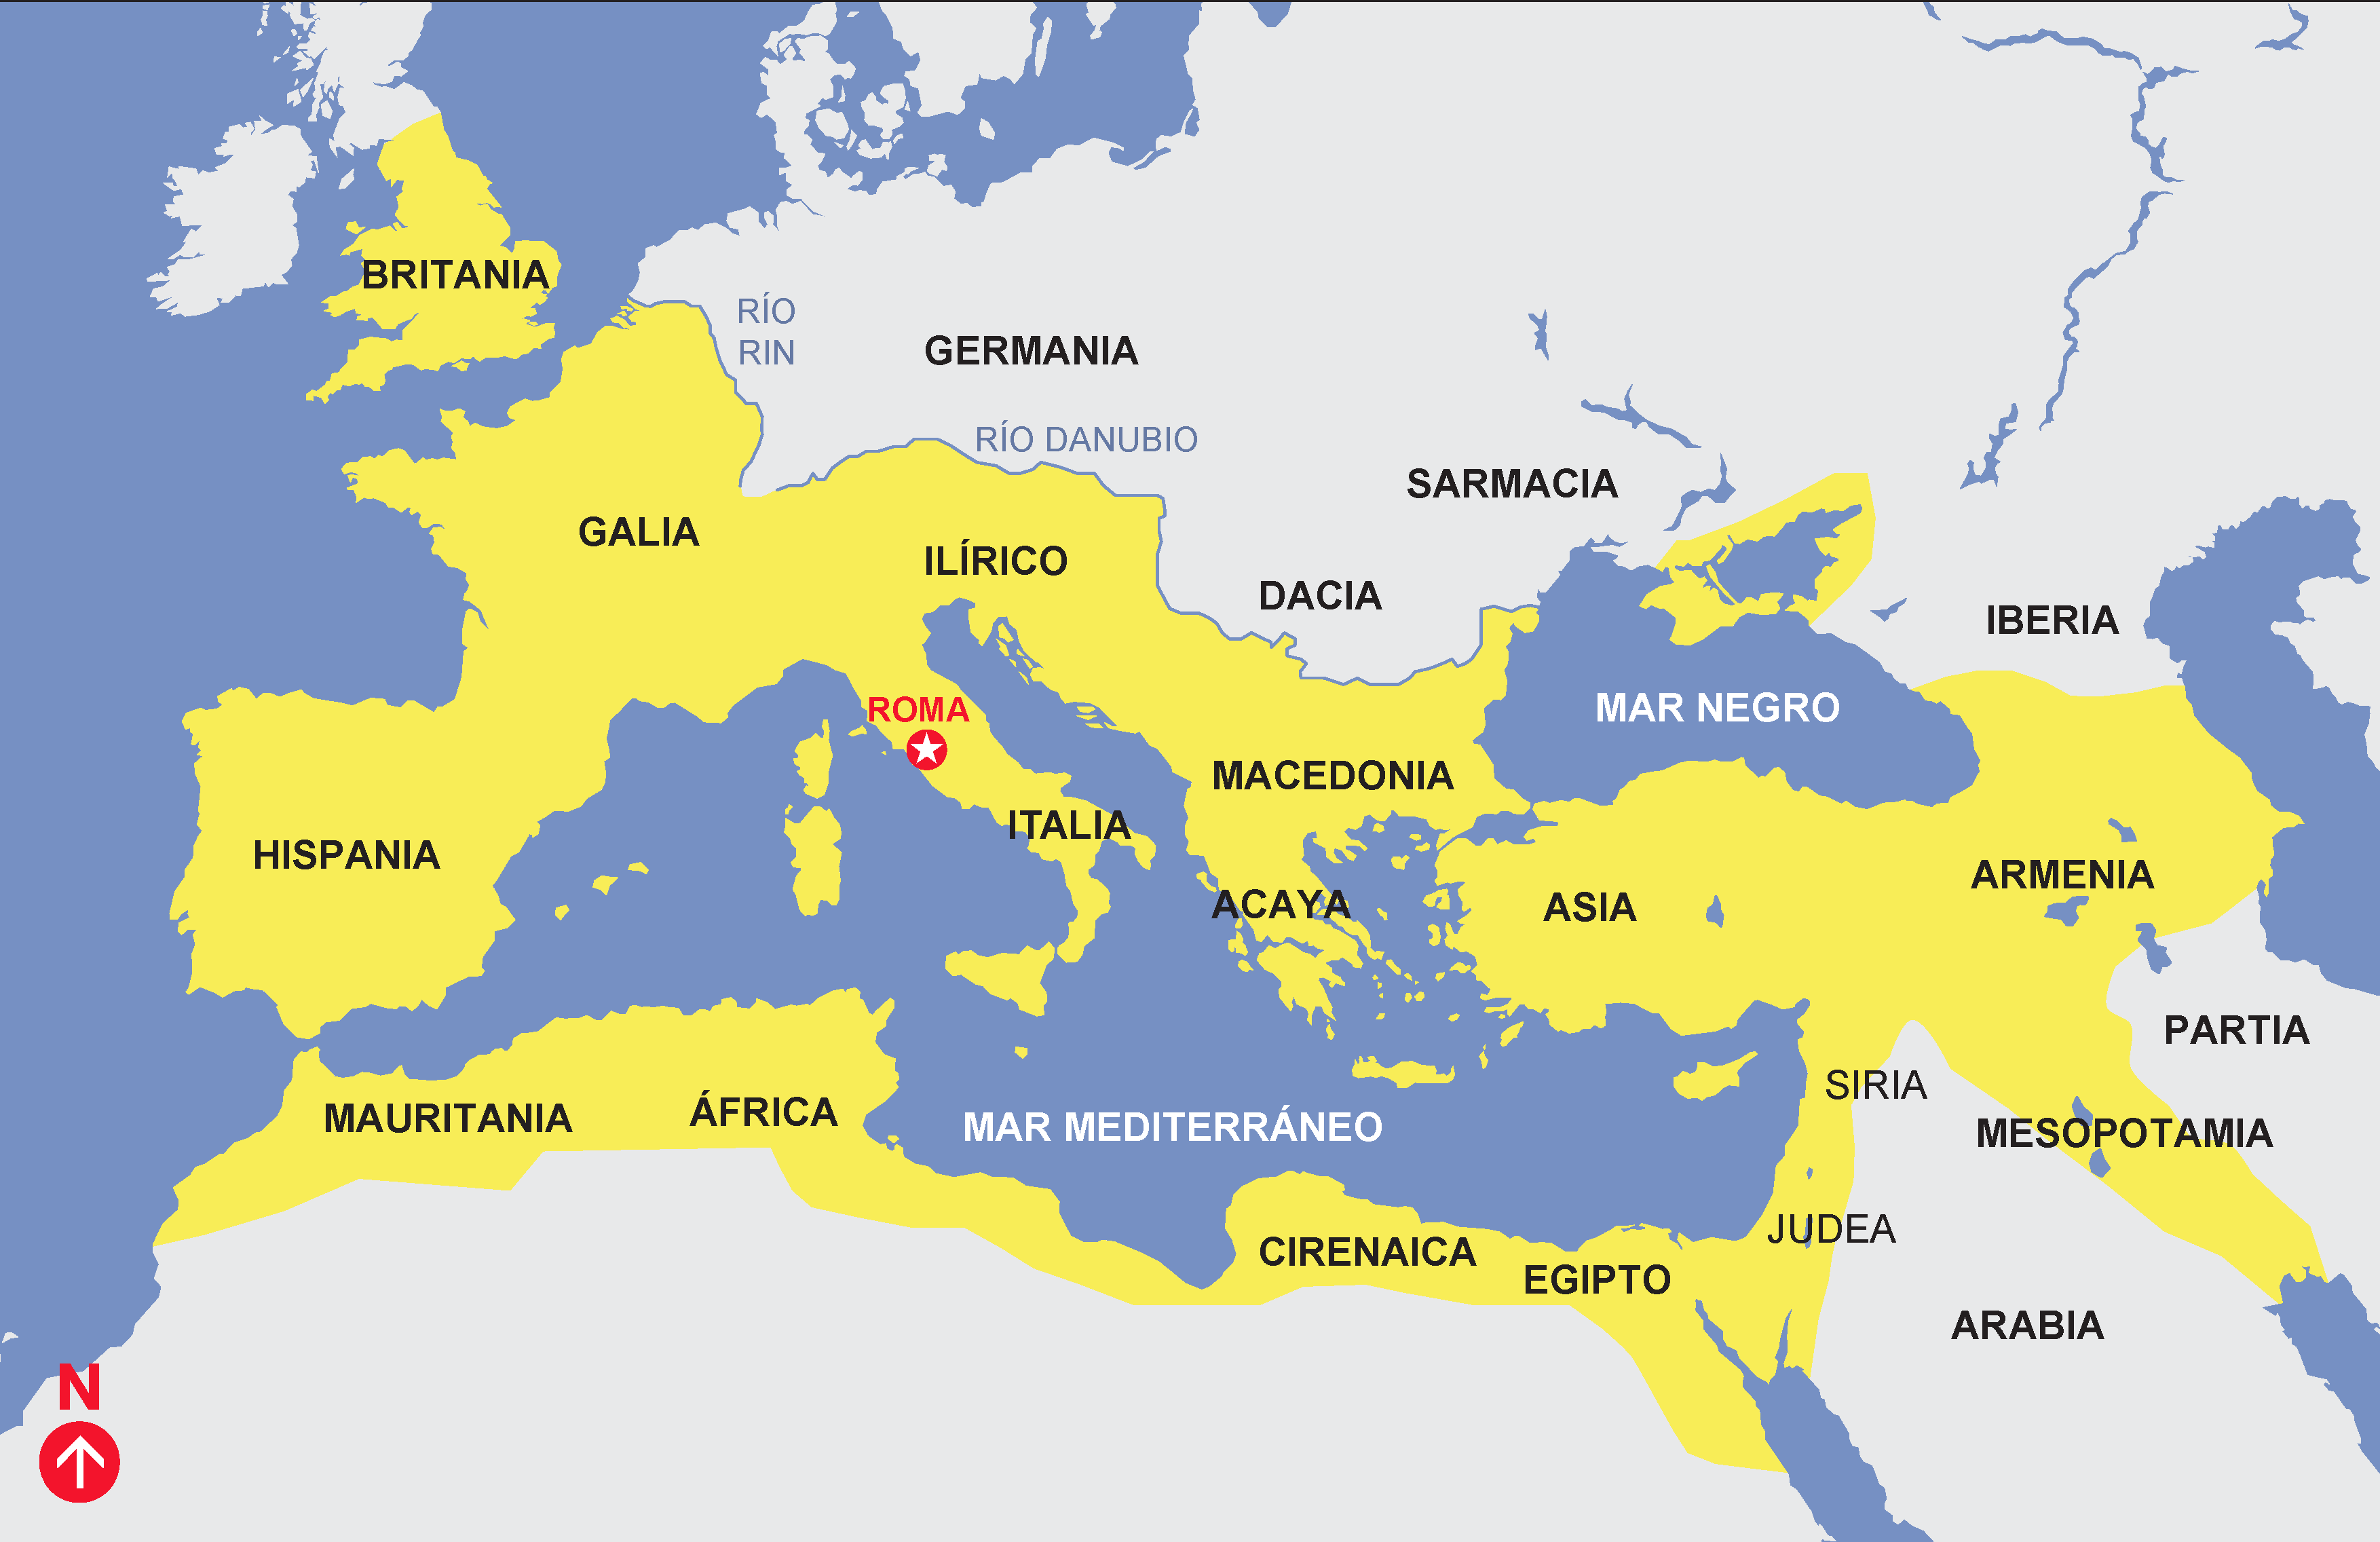 Pin De Angelica Pena Zambrano En Peninsula Imperio Romano Mapa Del A Geographical History Of Africa Paraphrase